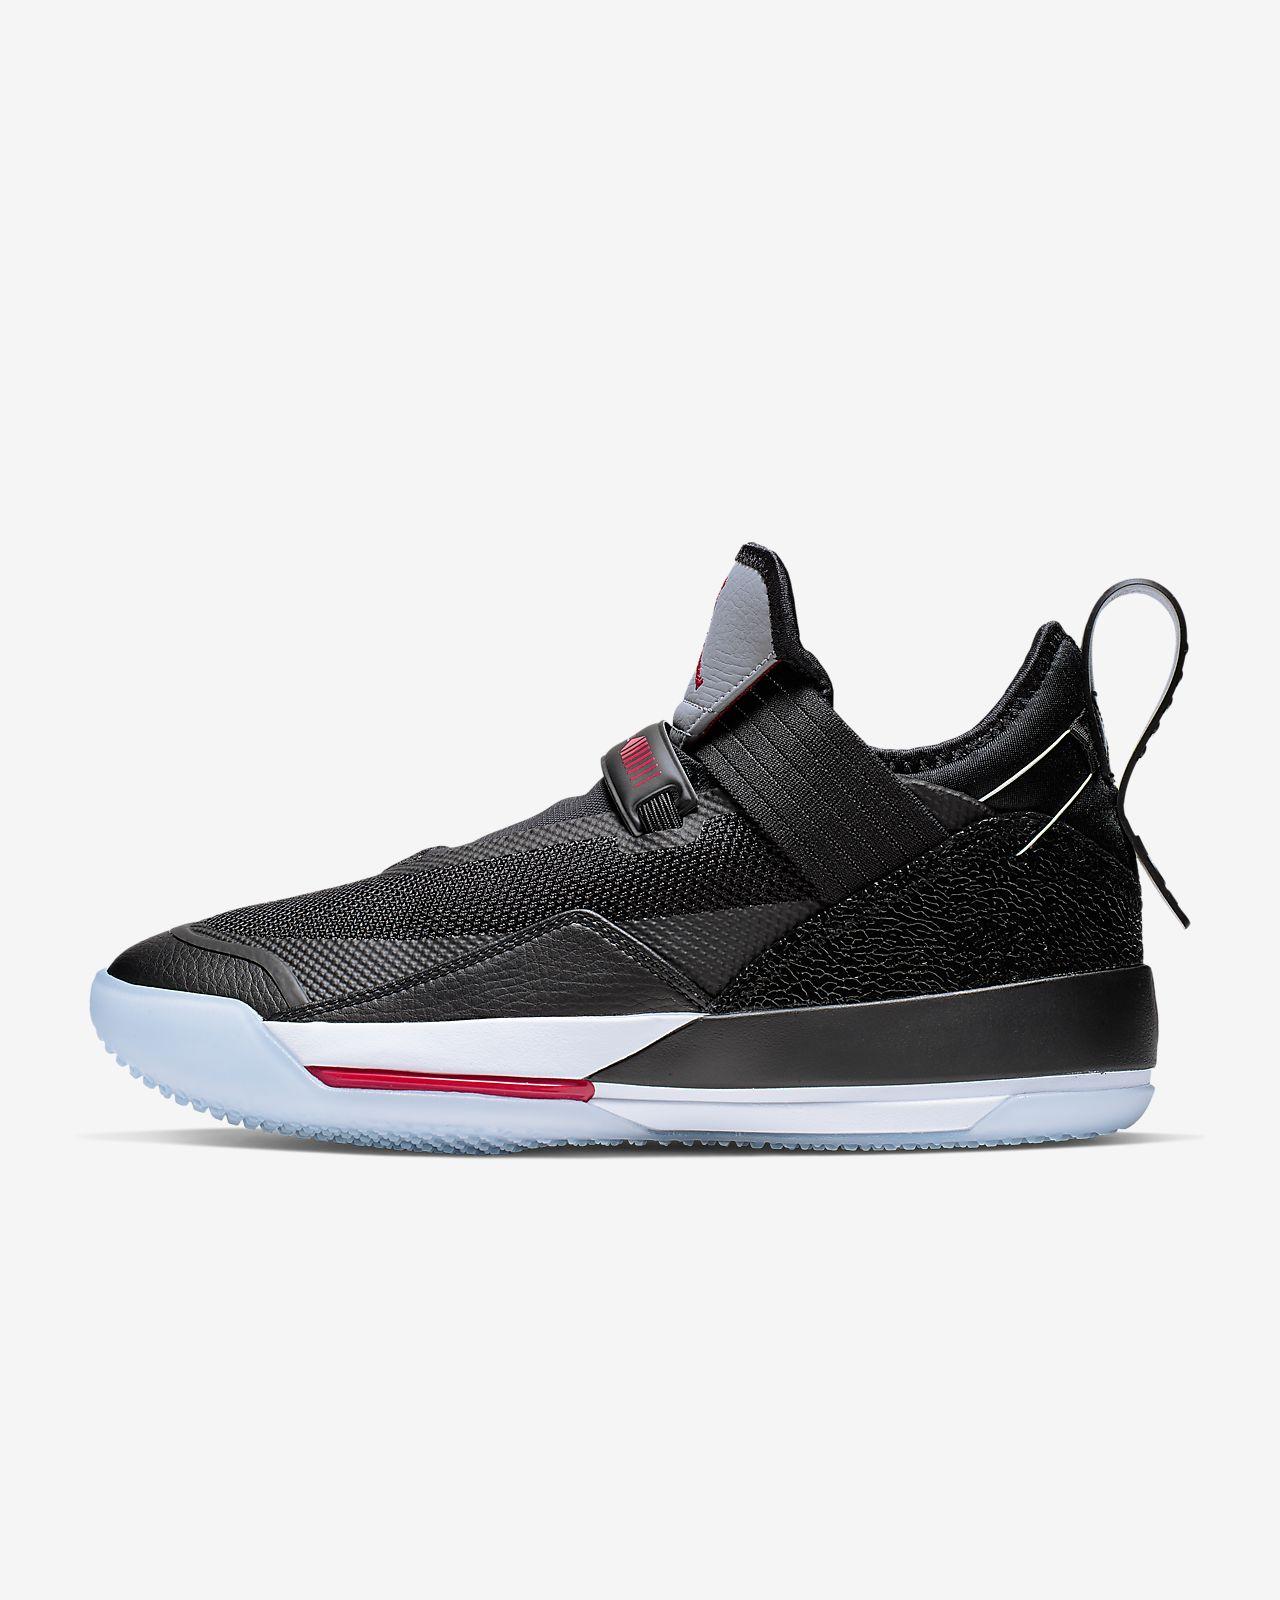 Sapatilhas de basquetebol Air Jordan XXXIII SE